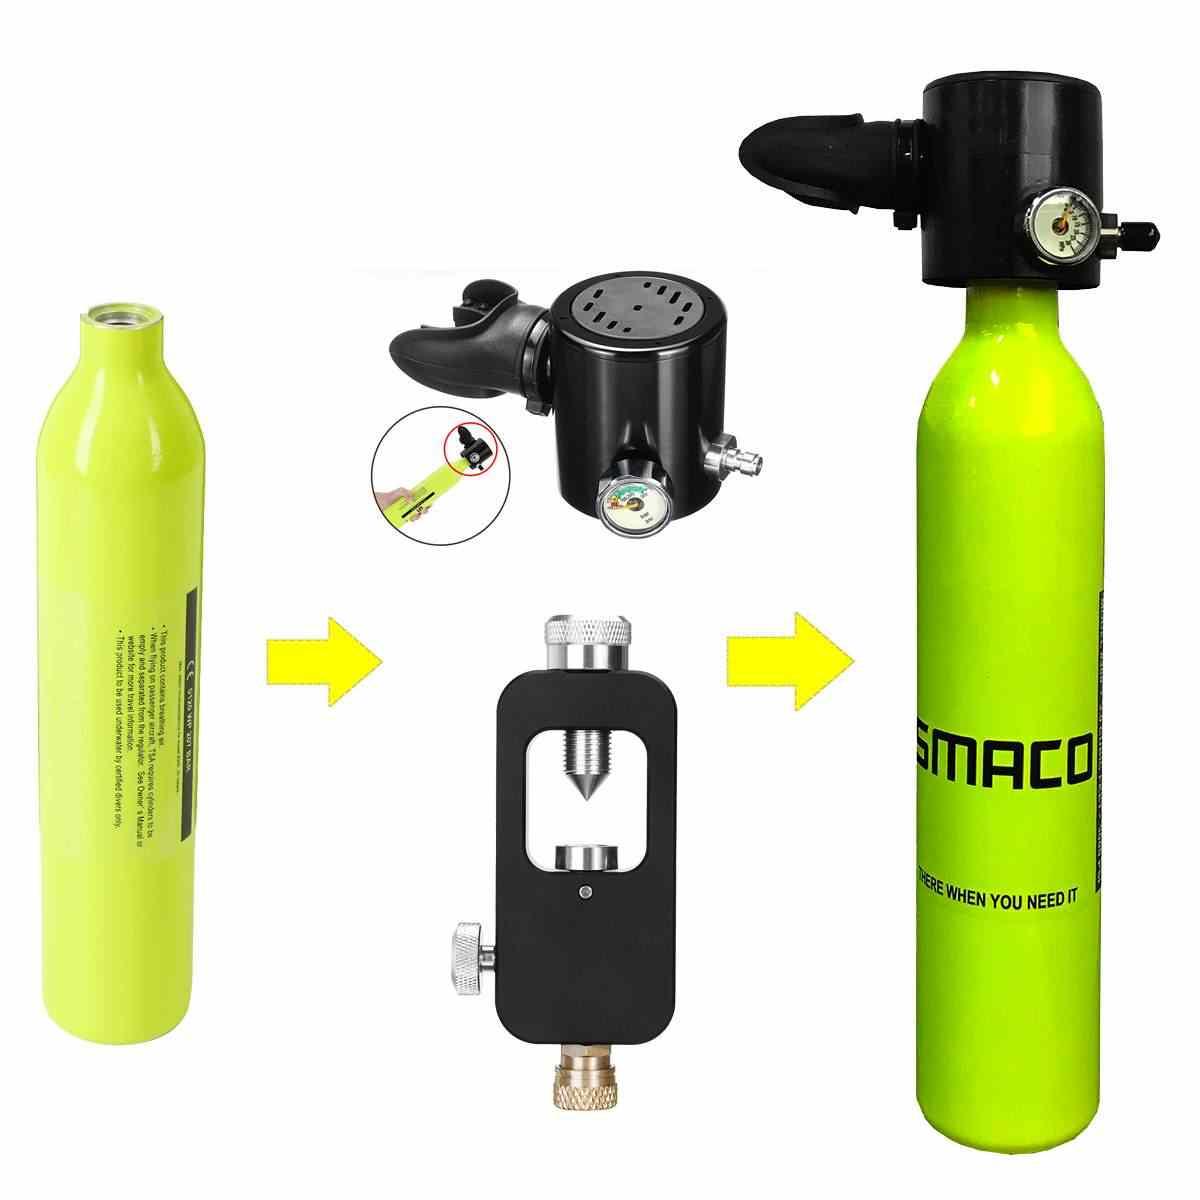 0.5L Mini Scuba Zuurstof Duiken Apparatuur Lucht Tanks Cilinderkop Valve Mondstuk Adapter Snorkelen Onderwater Ademhaling Apparaat